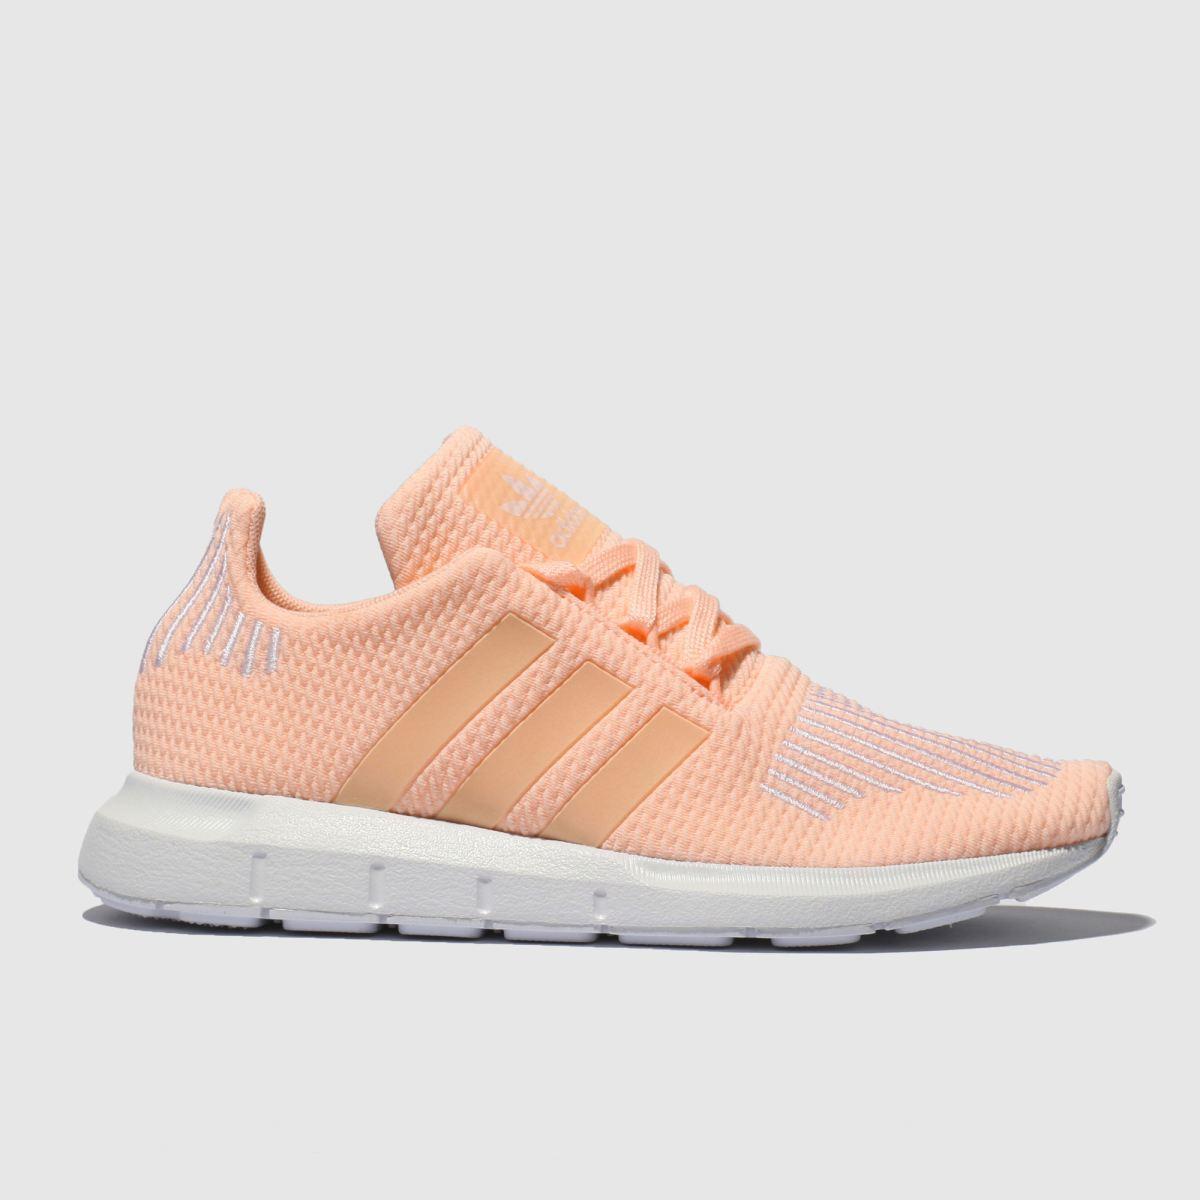 Adidas Peach Swift Run Trainers Youth